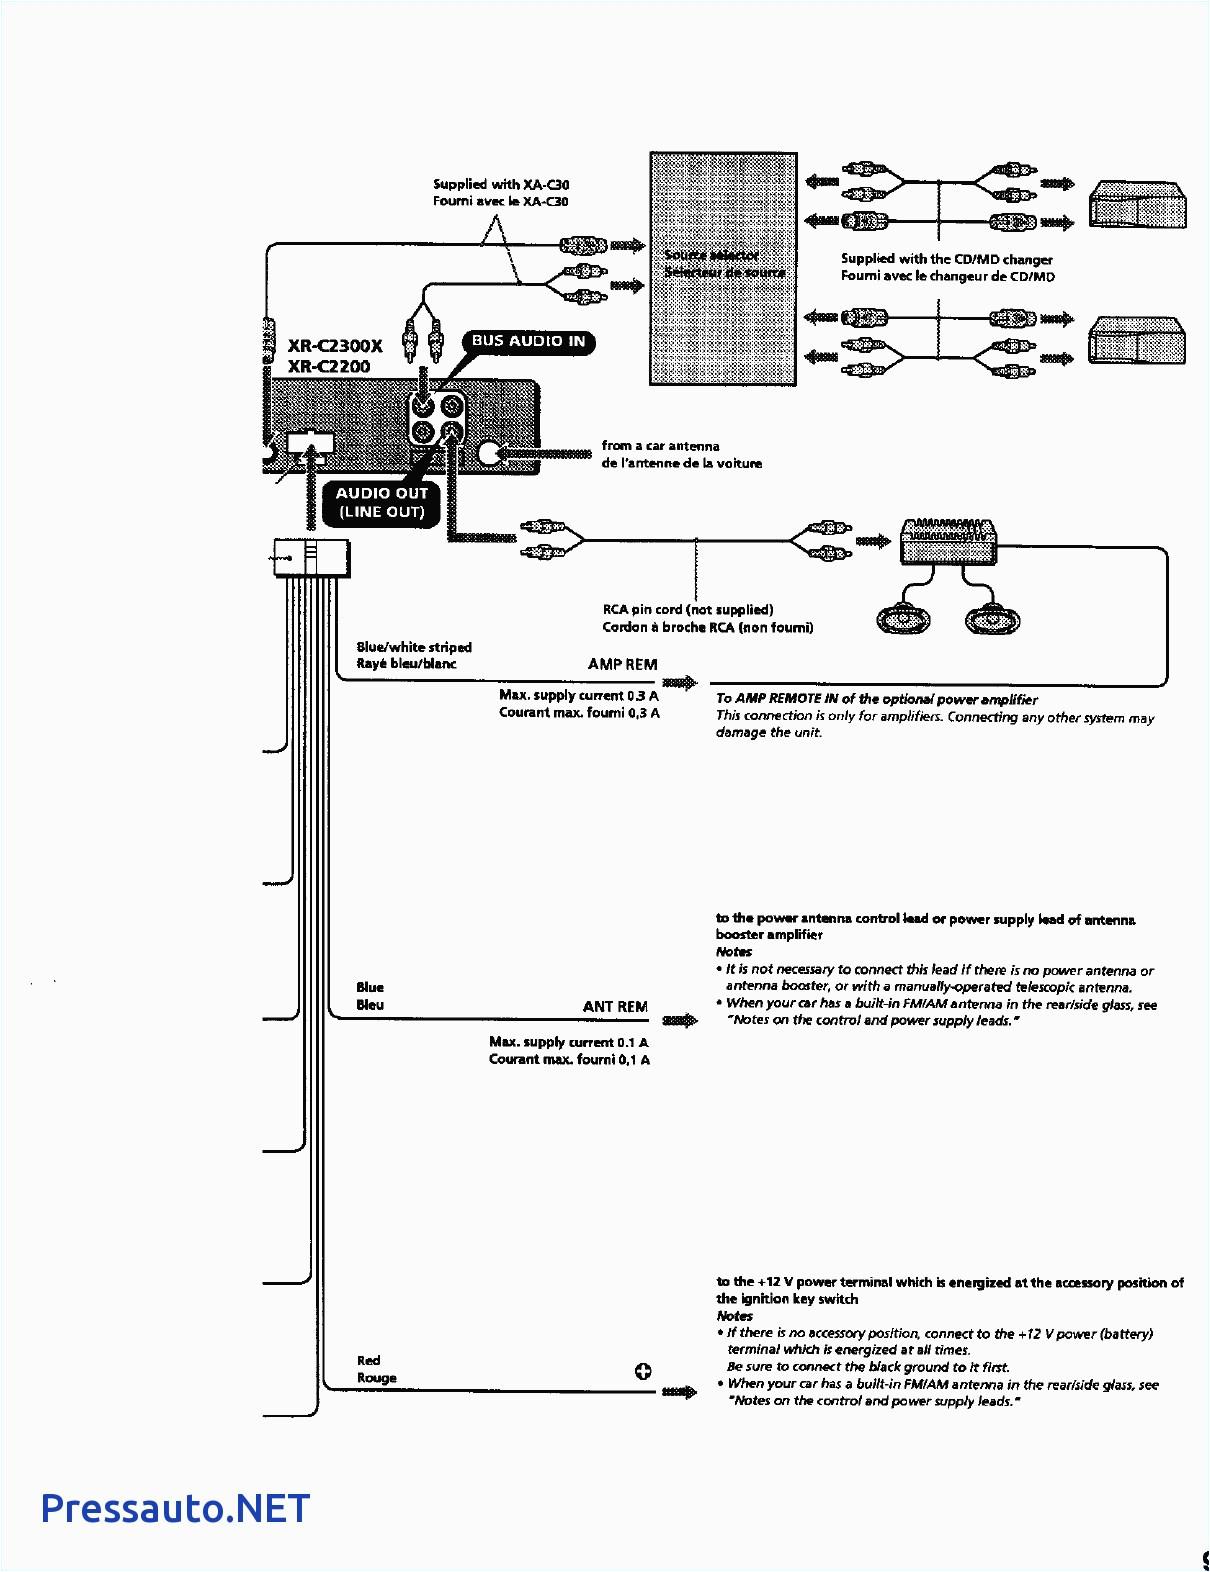 sony xplod wiring diagram on sony m 610 wiring harness diagram sony m 610 wiring harness diagram